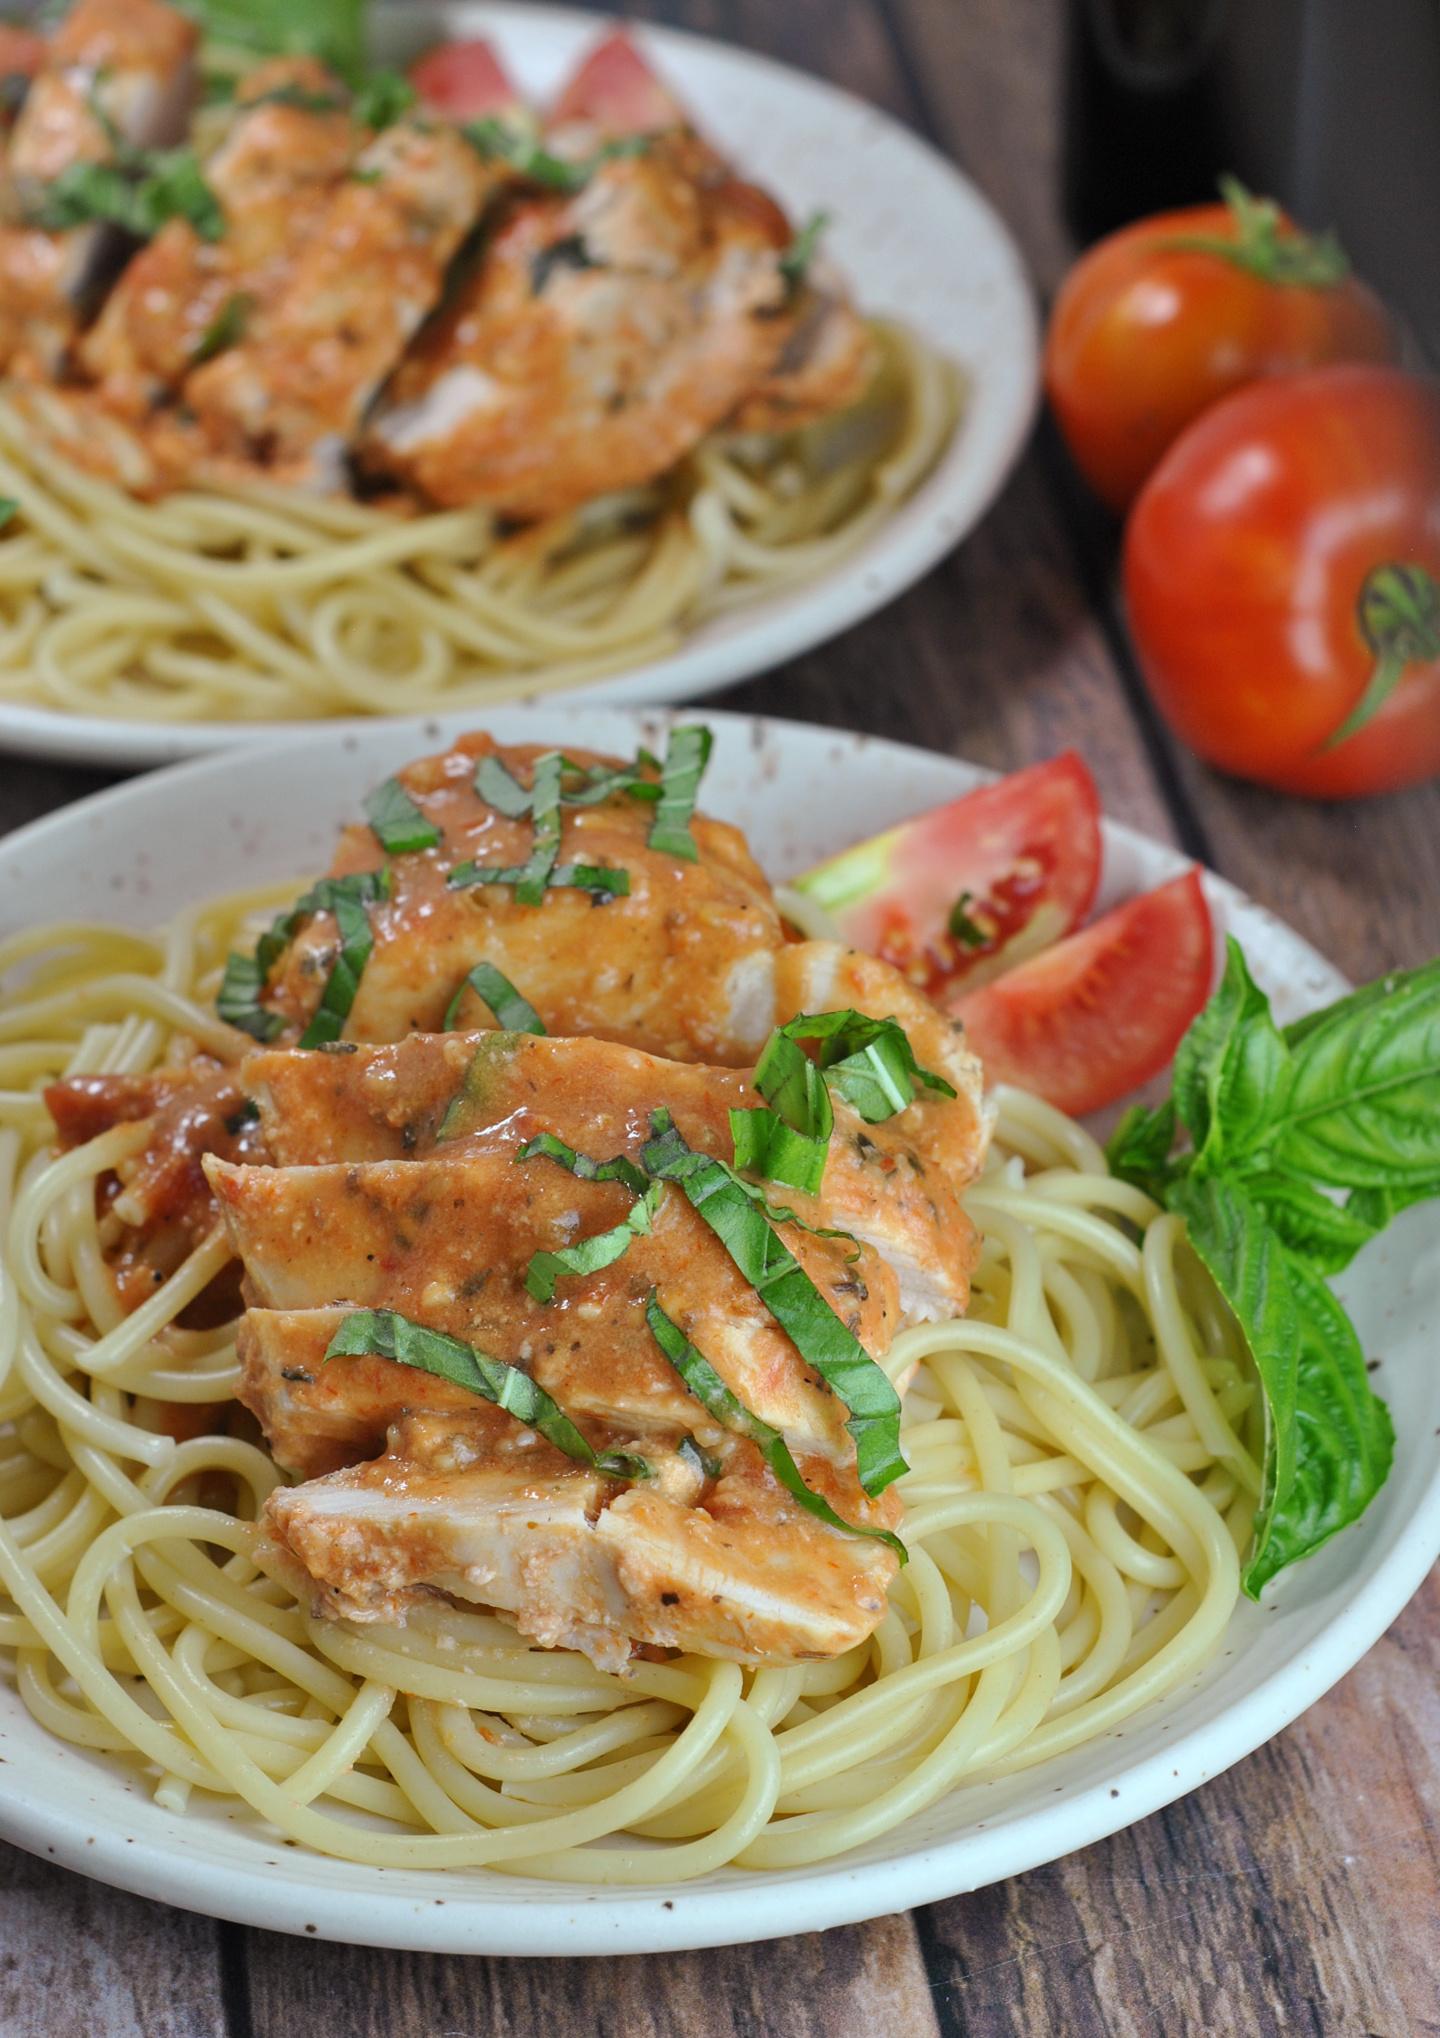 Slow Cooker Creamy Tomato Basil Chicken via @preventionrd